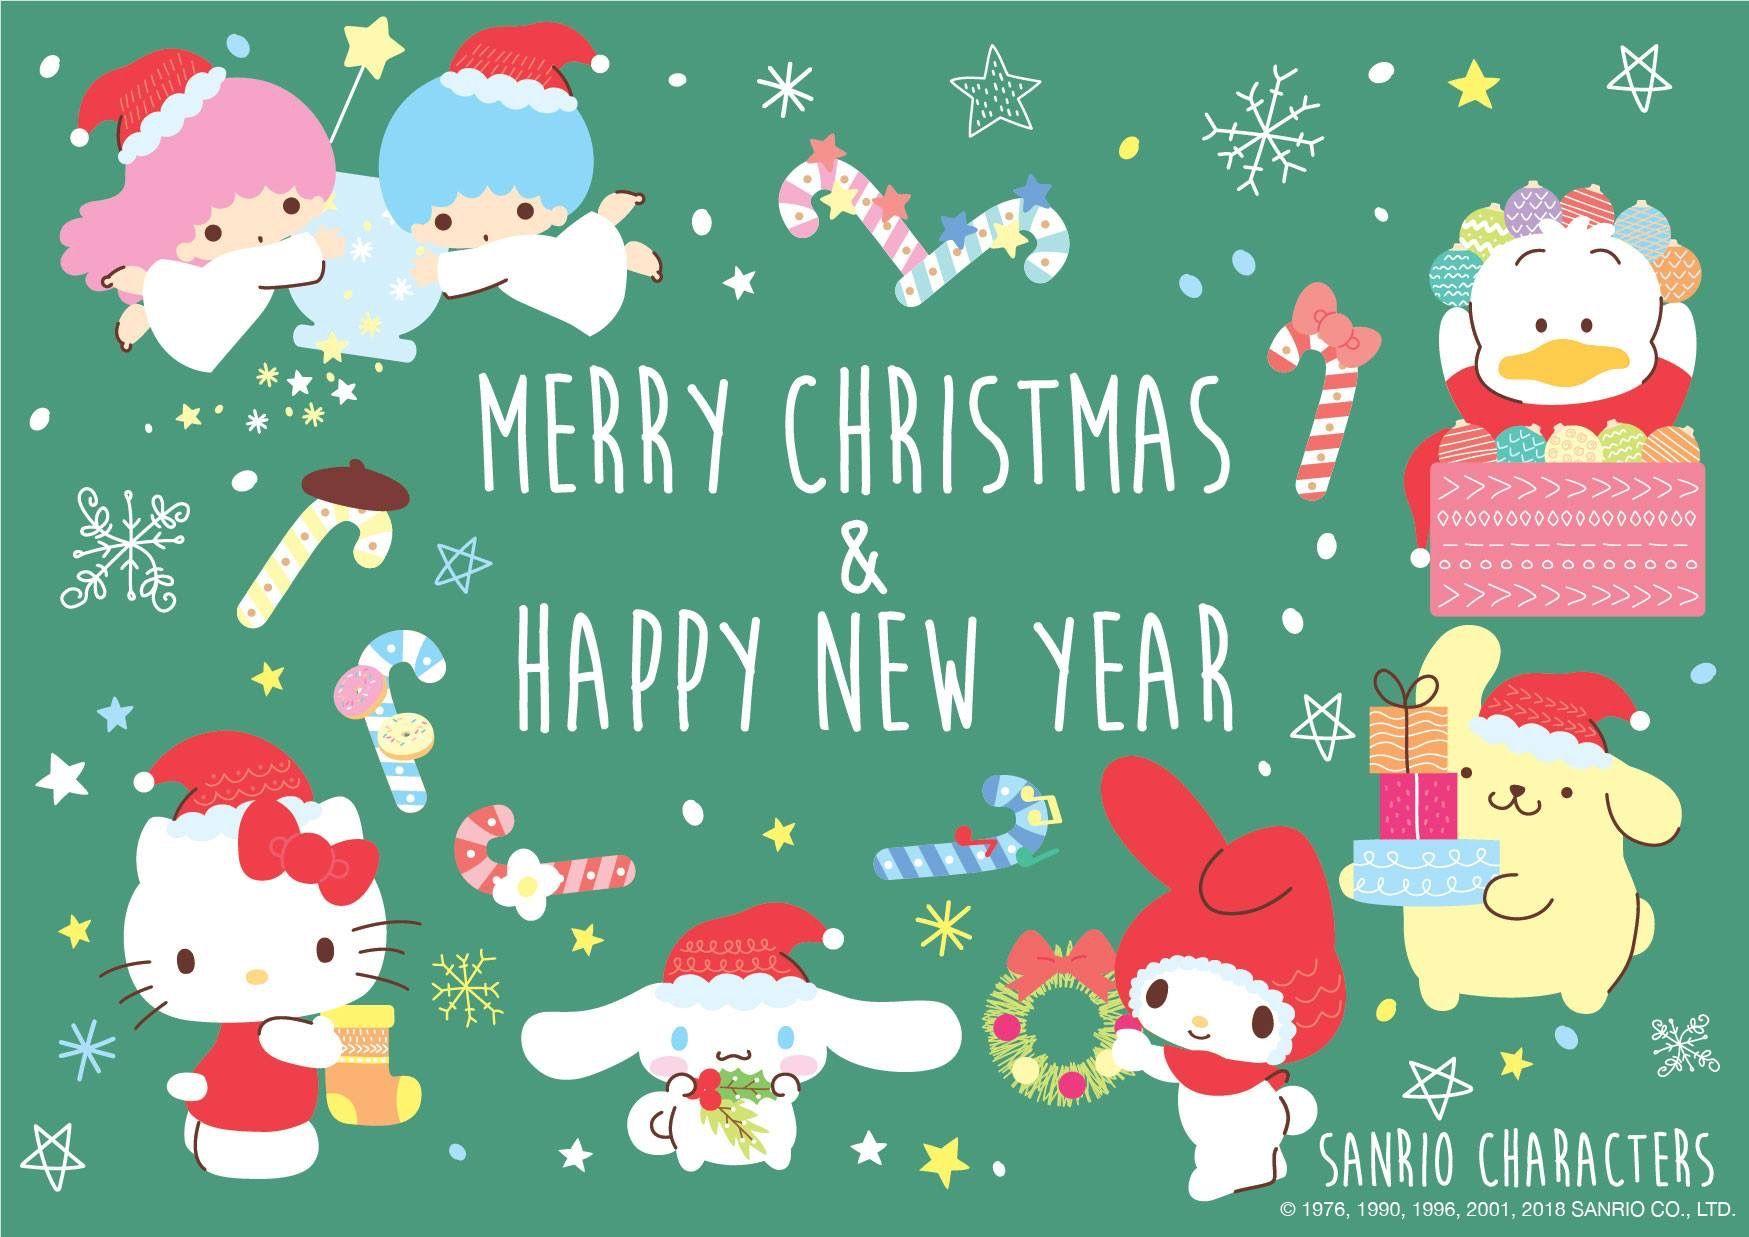 Merry Christmas Happy New Year Hello Kitty Christmas Cards Hello Kitty Christmas Hello Kitty Wallpaper